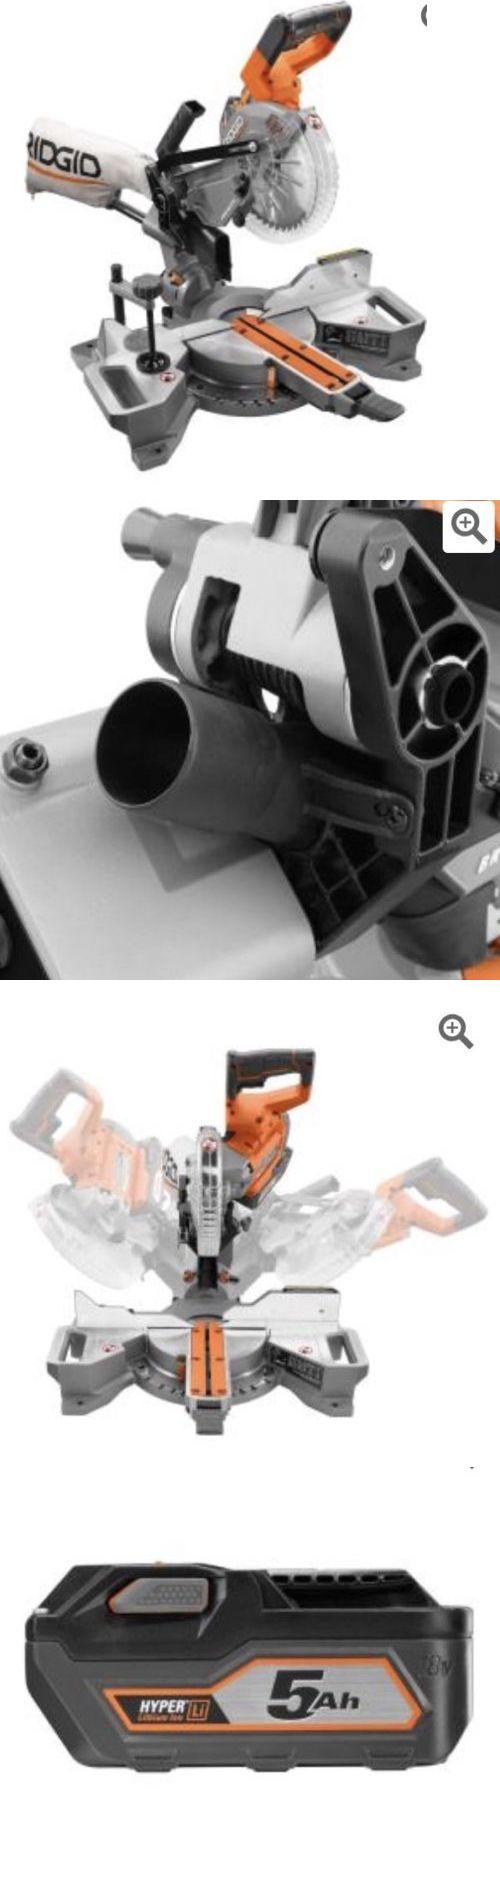 Miter and Chop Saws 20787: Ridgid R48607k 18V 7-1 4 Cordless Brushless Dual Bevel Sliding Miter Saw Kit -> BUY IT NOW ONLY: $300 on eBay!